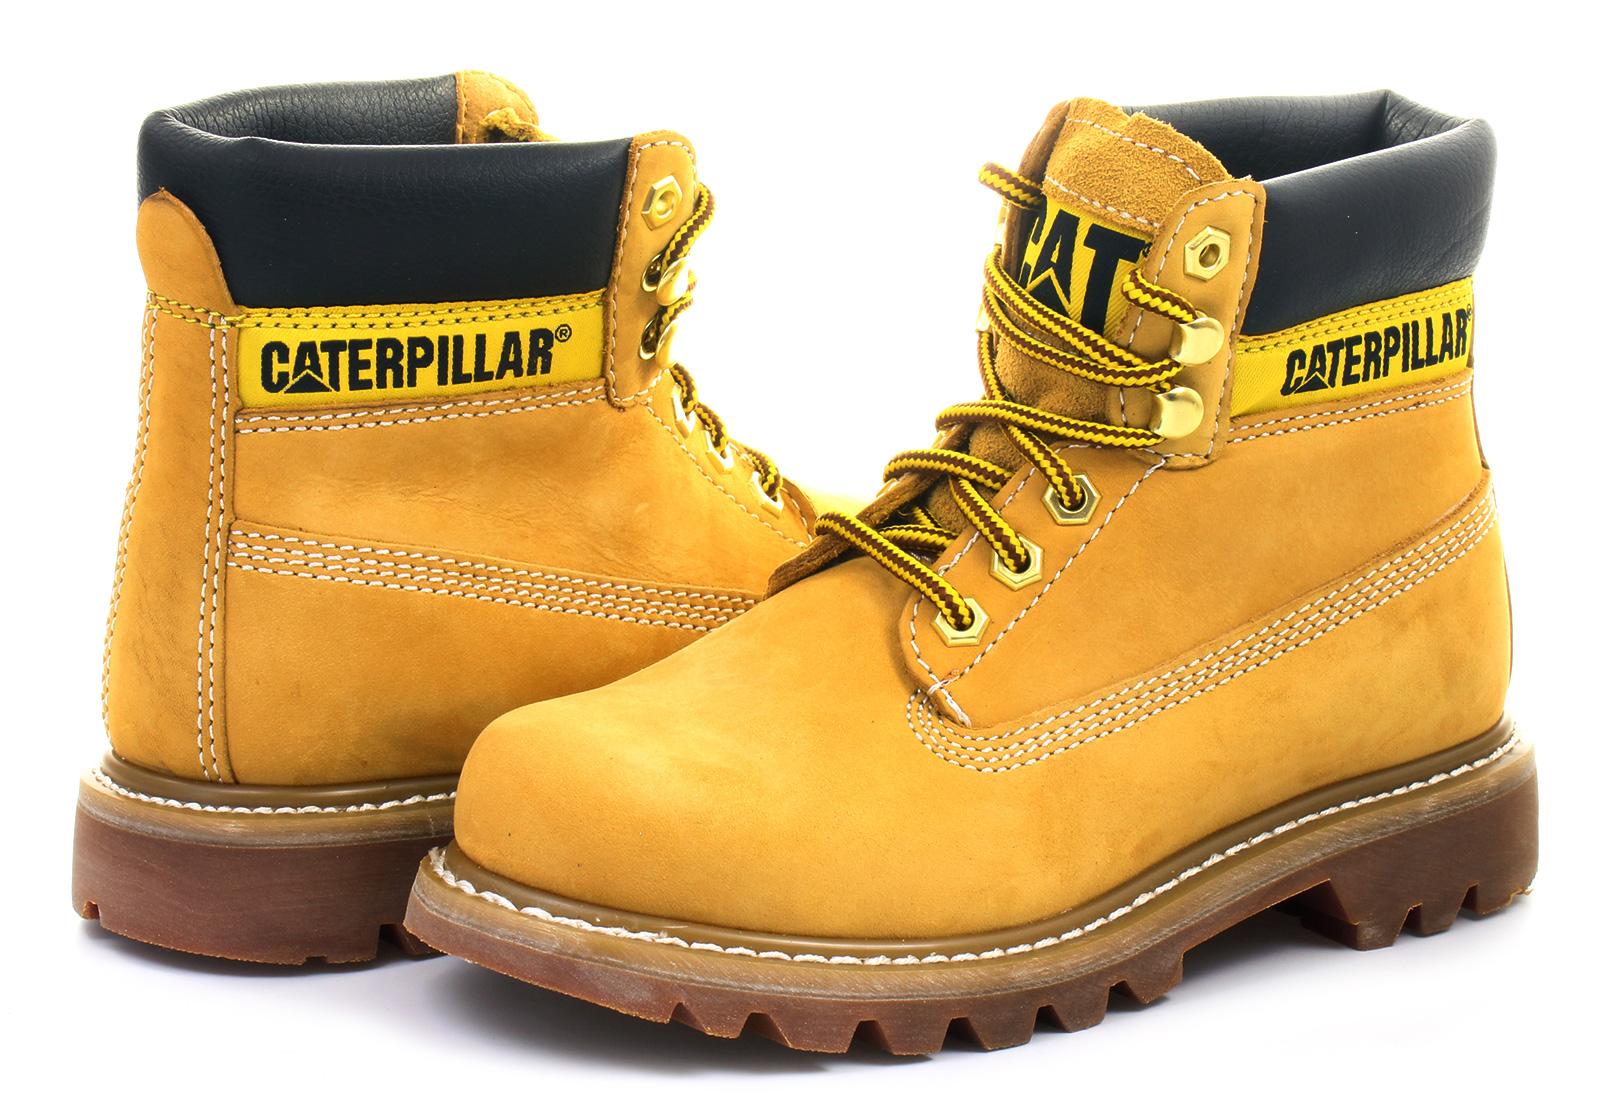 Cat Topánky - Colorado - 306831-hon - Tenisky 2fdca858d00